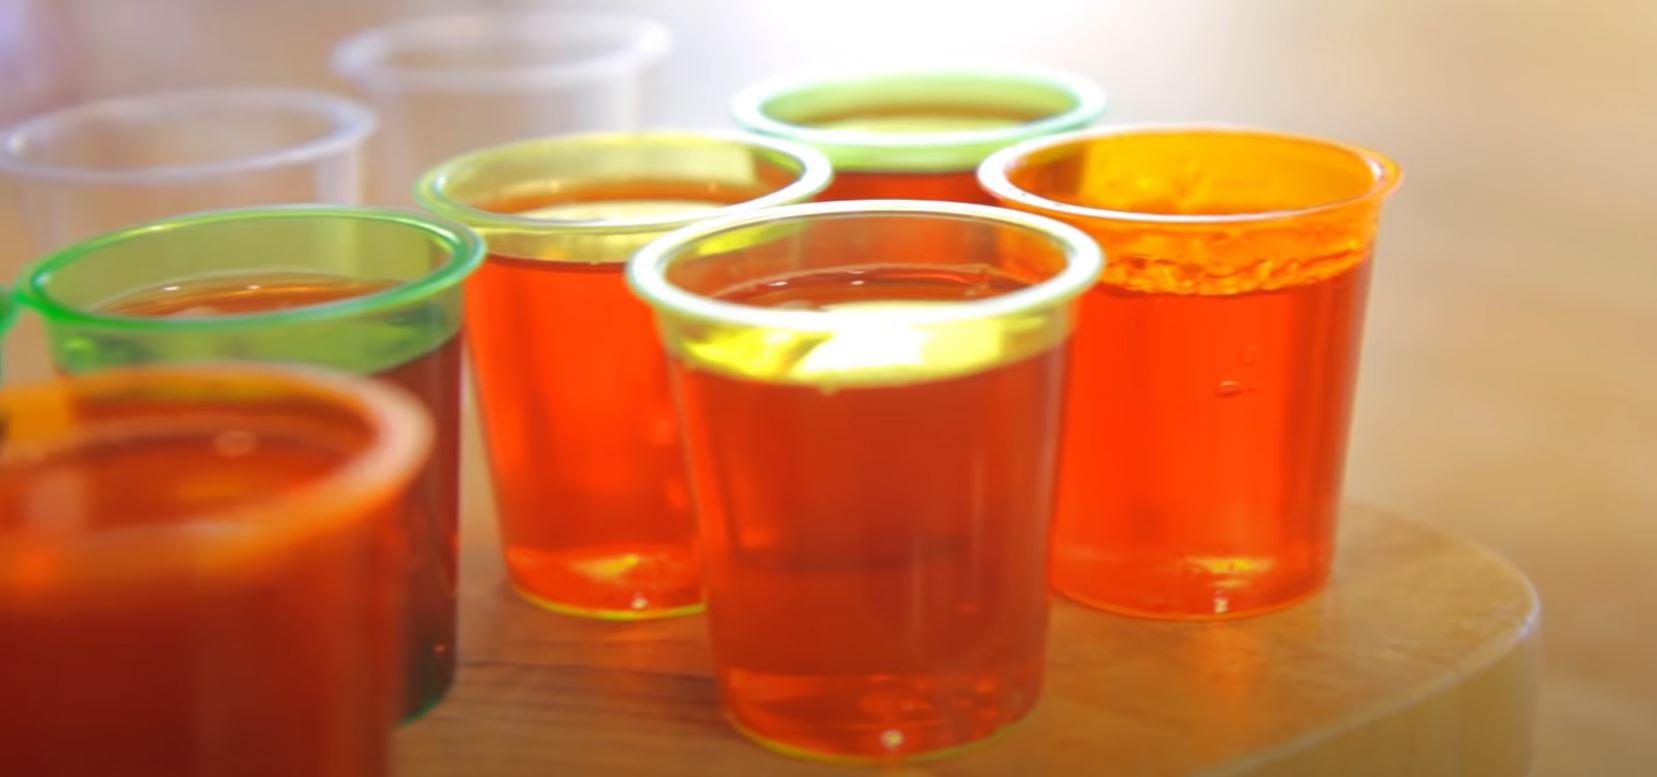 jello shots for grown-ups recipe